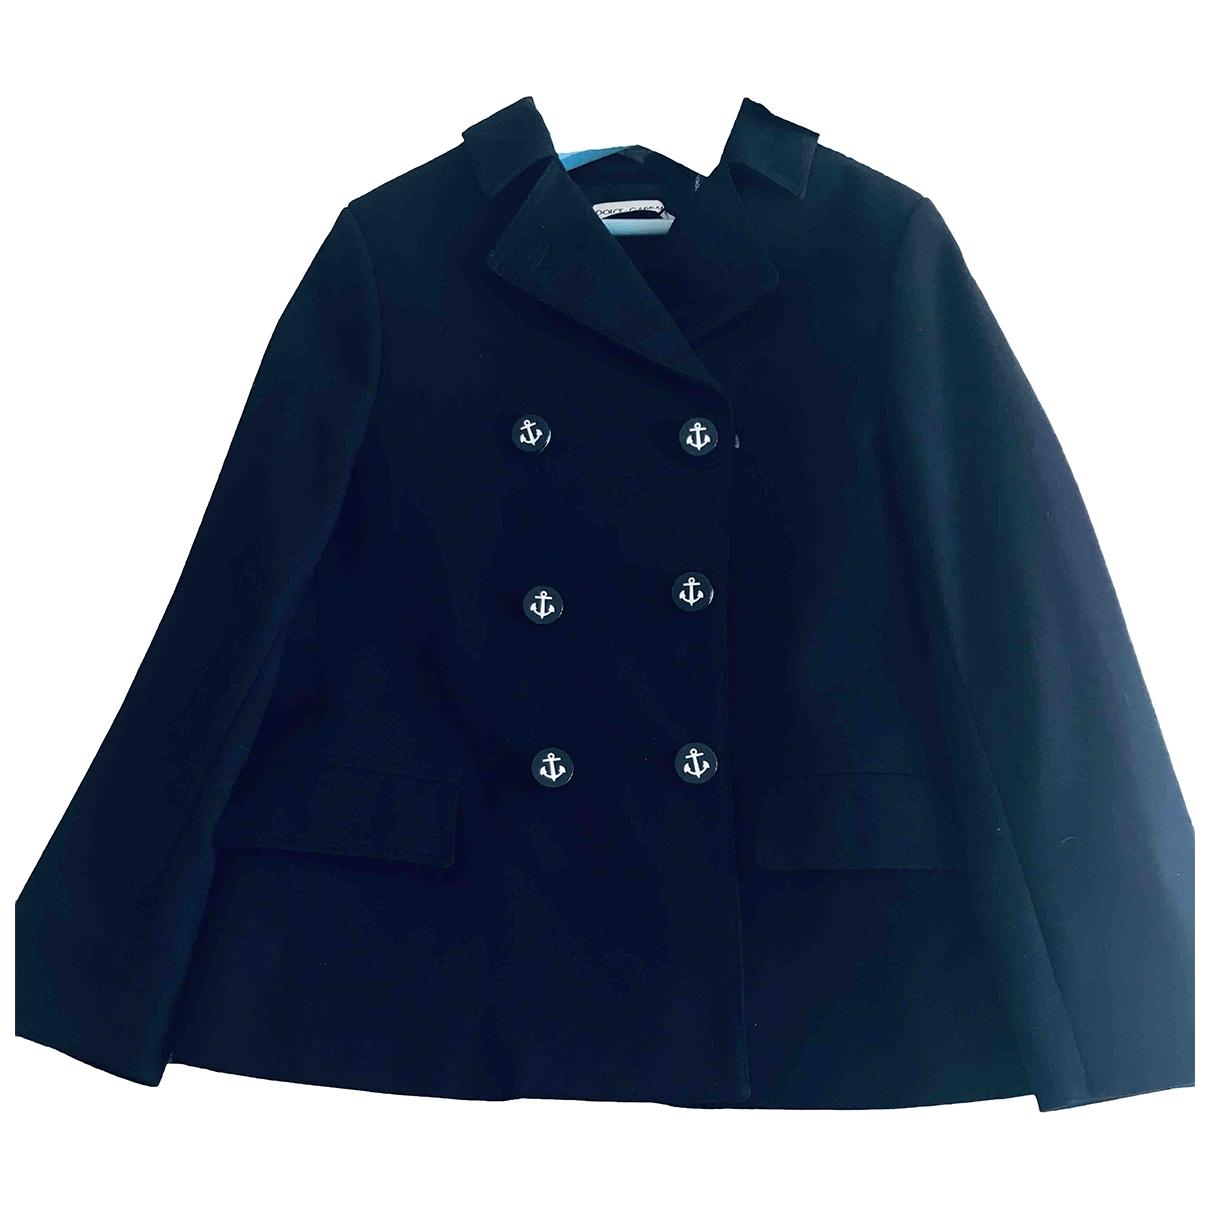 Dolce & Gabbana \N Jacke, Maentel in  Marine Baumwolle